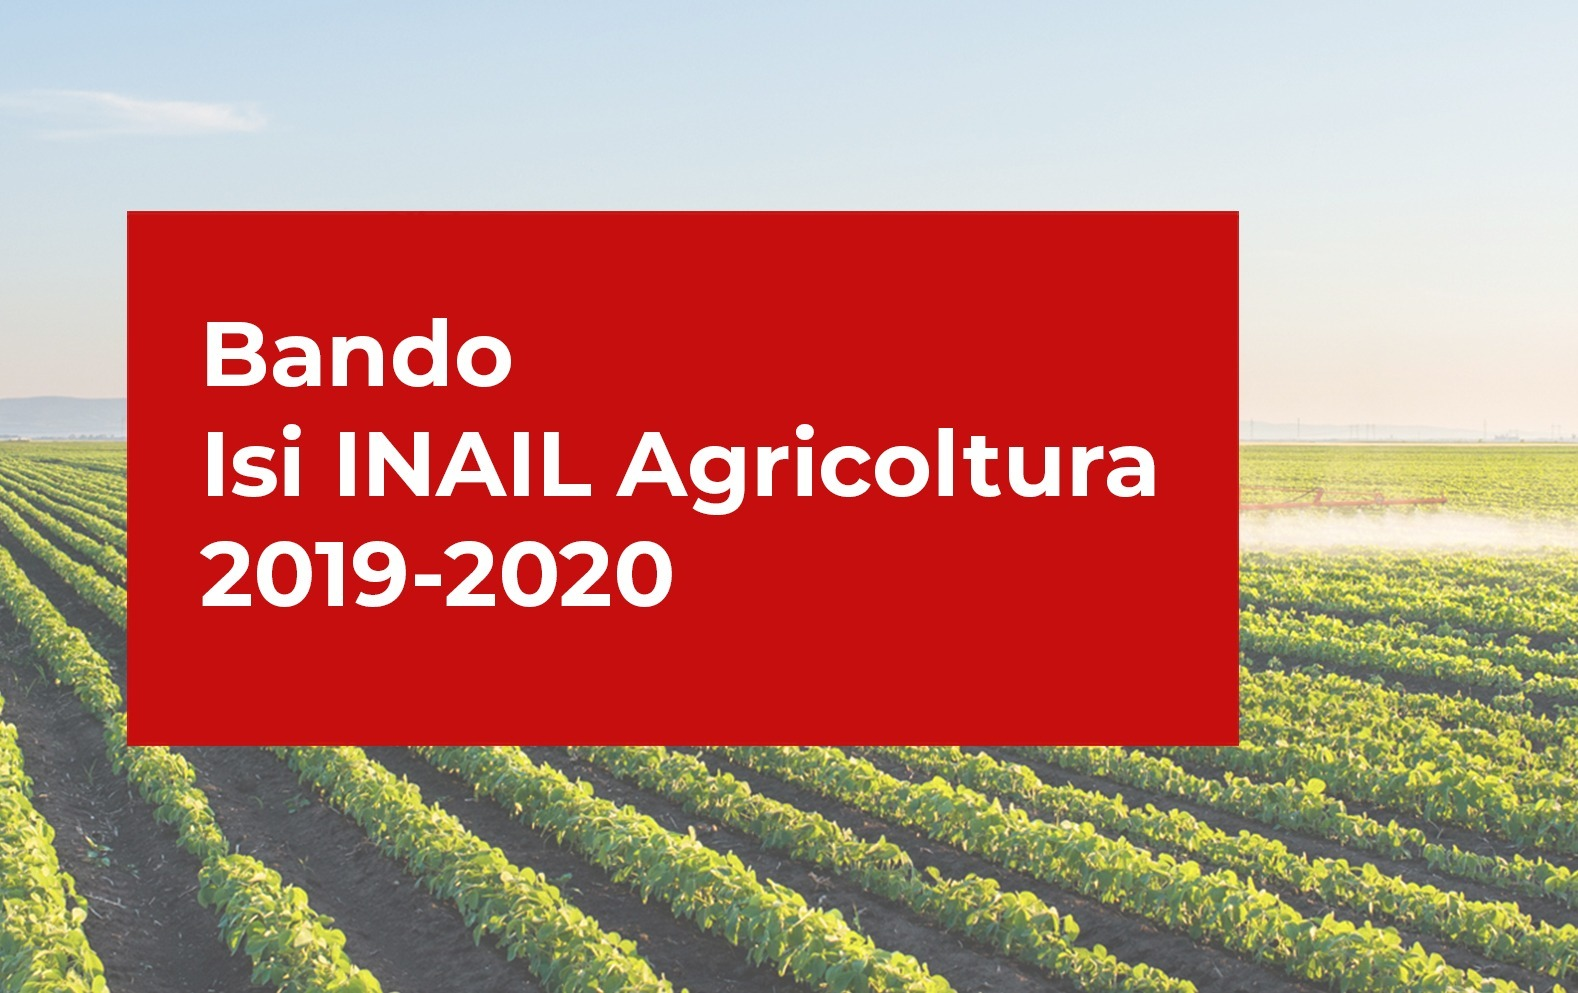 bando inail agricoltura 2019-2020